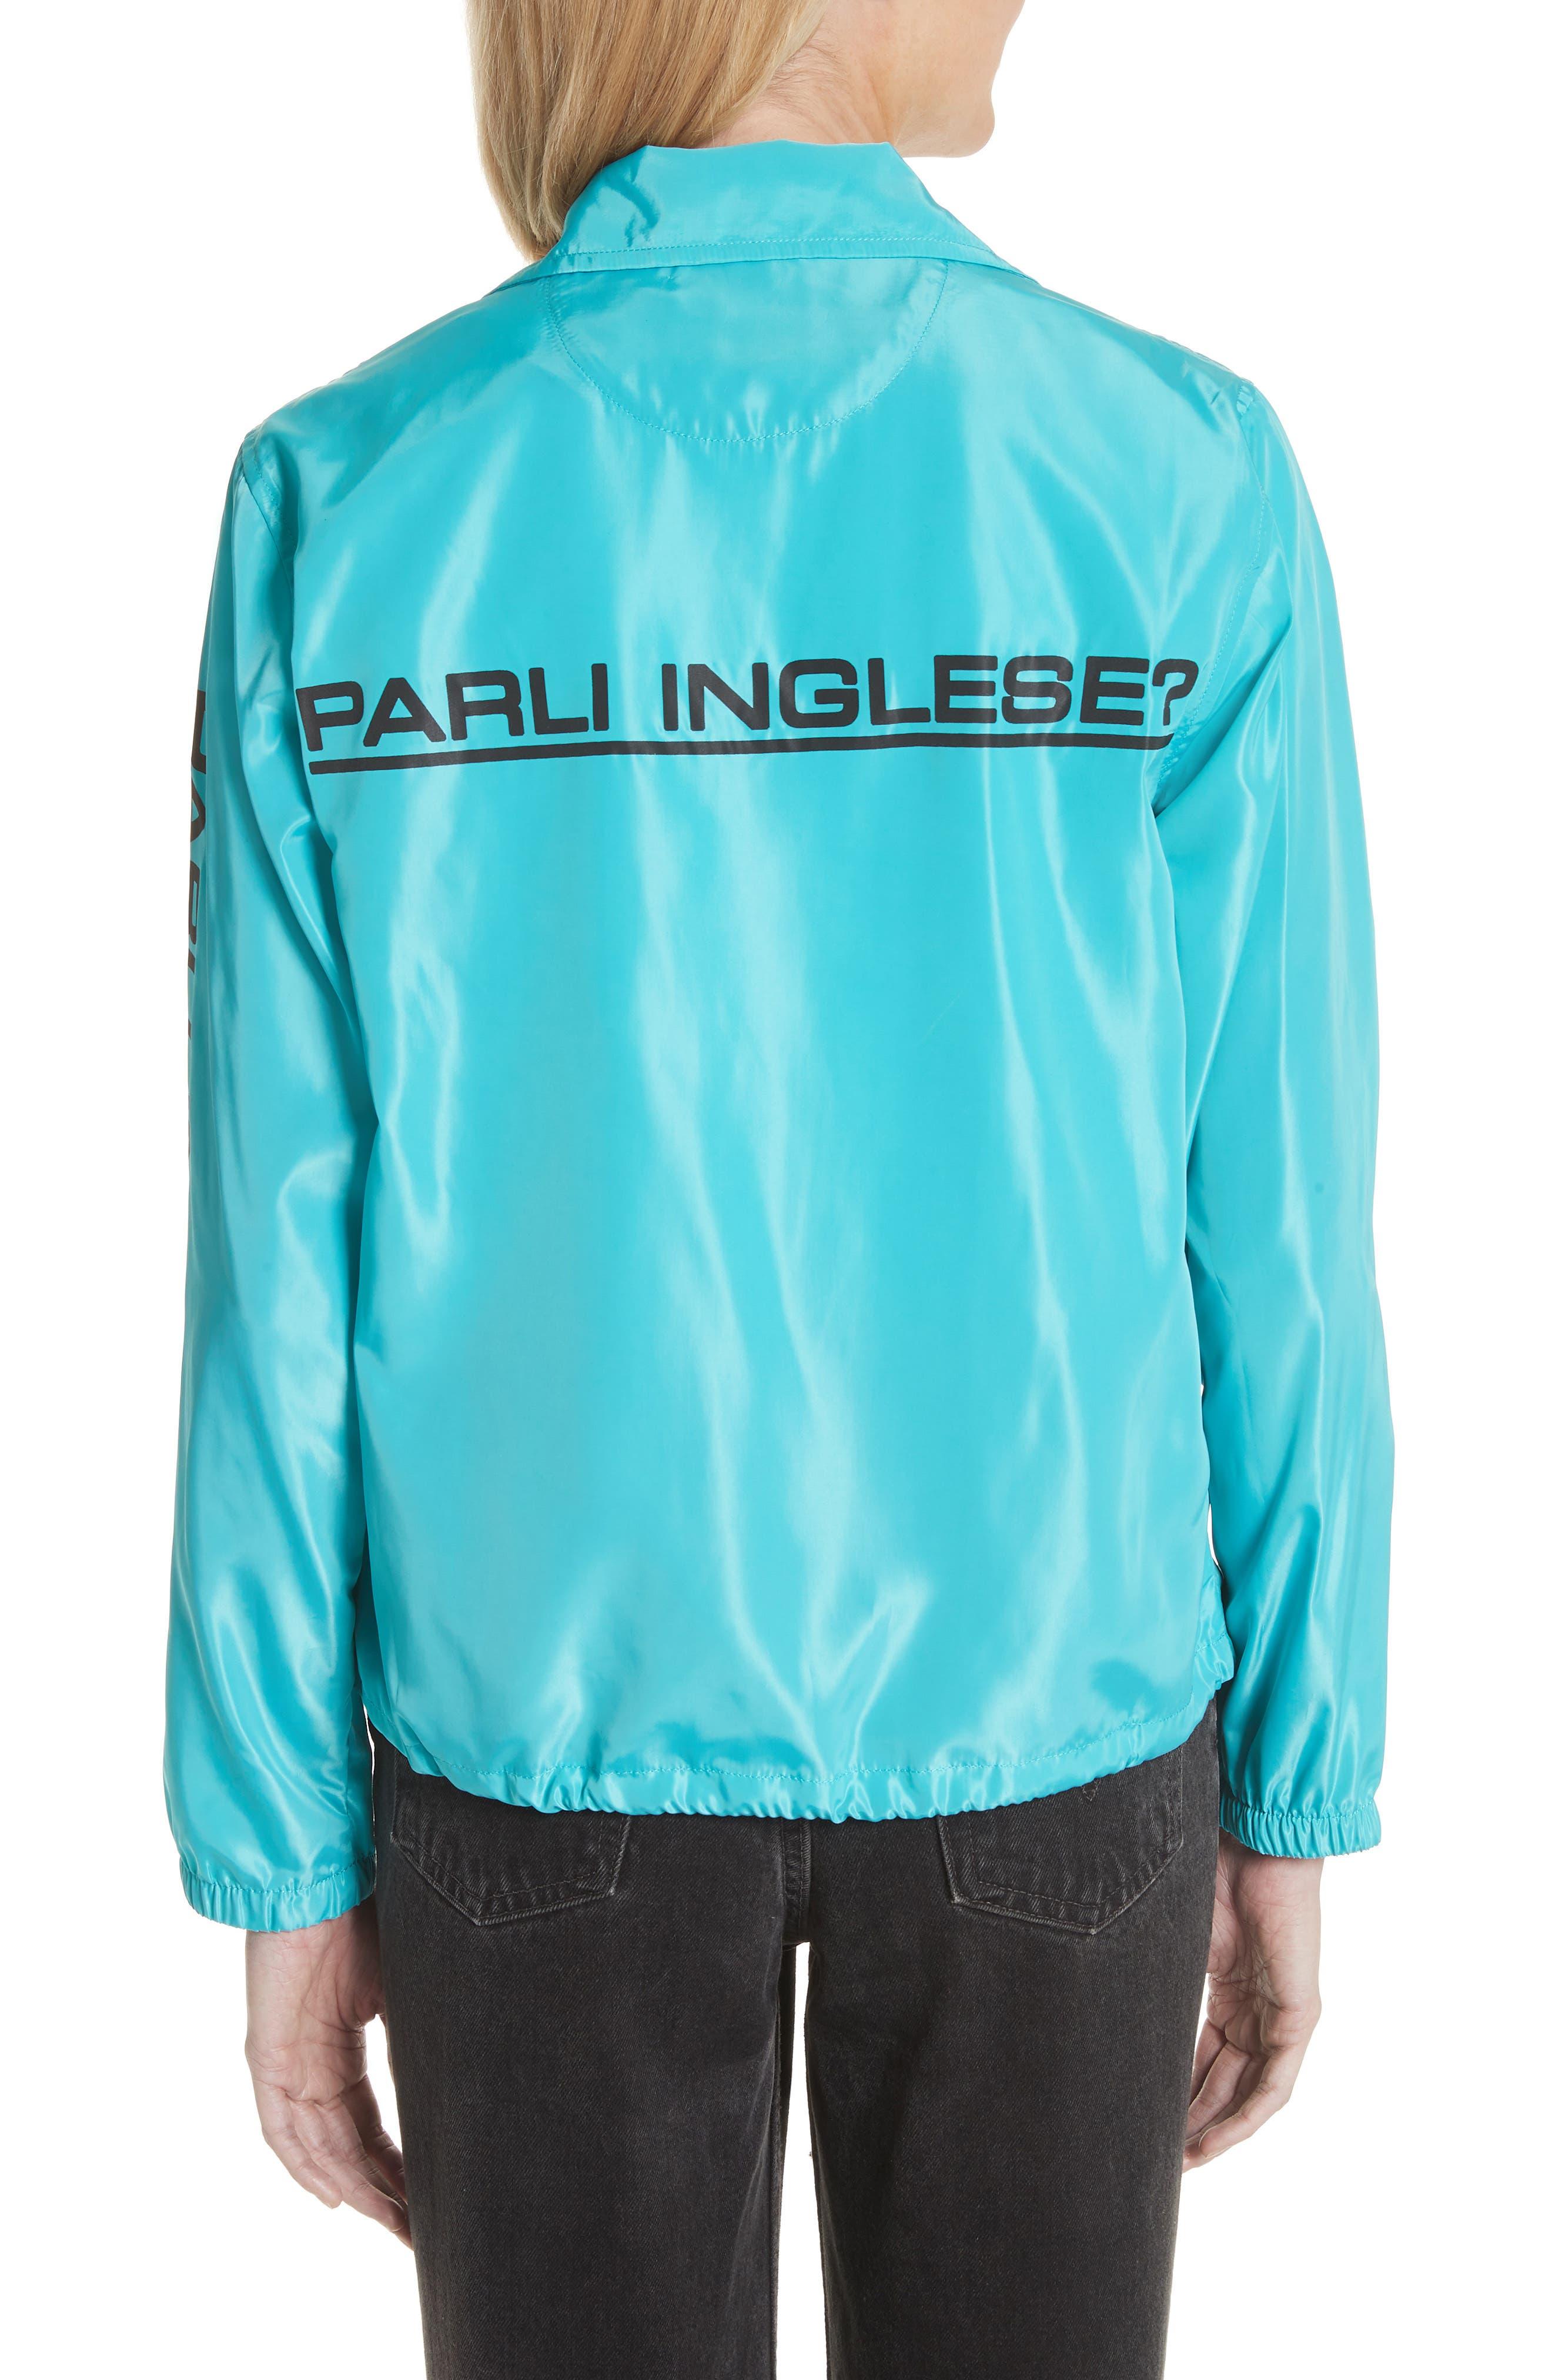 Parli Inglese Coach Jacket,                             Alternate thumbnail 2, color,                             Turquoise